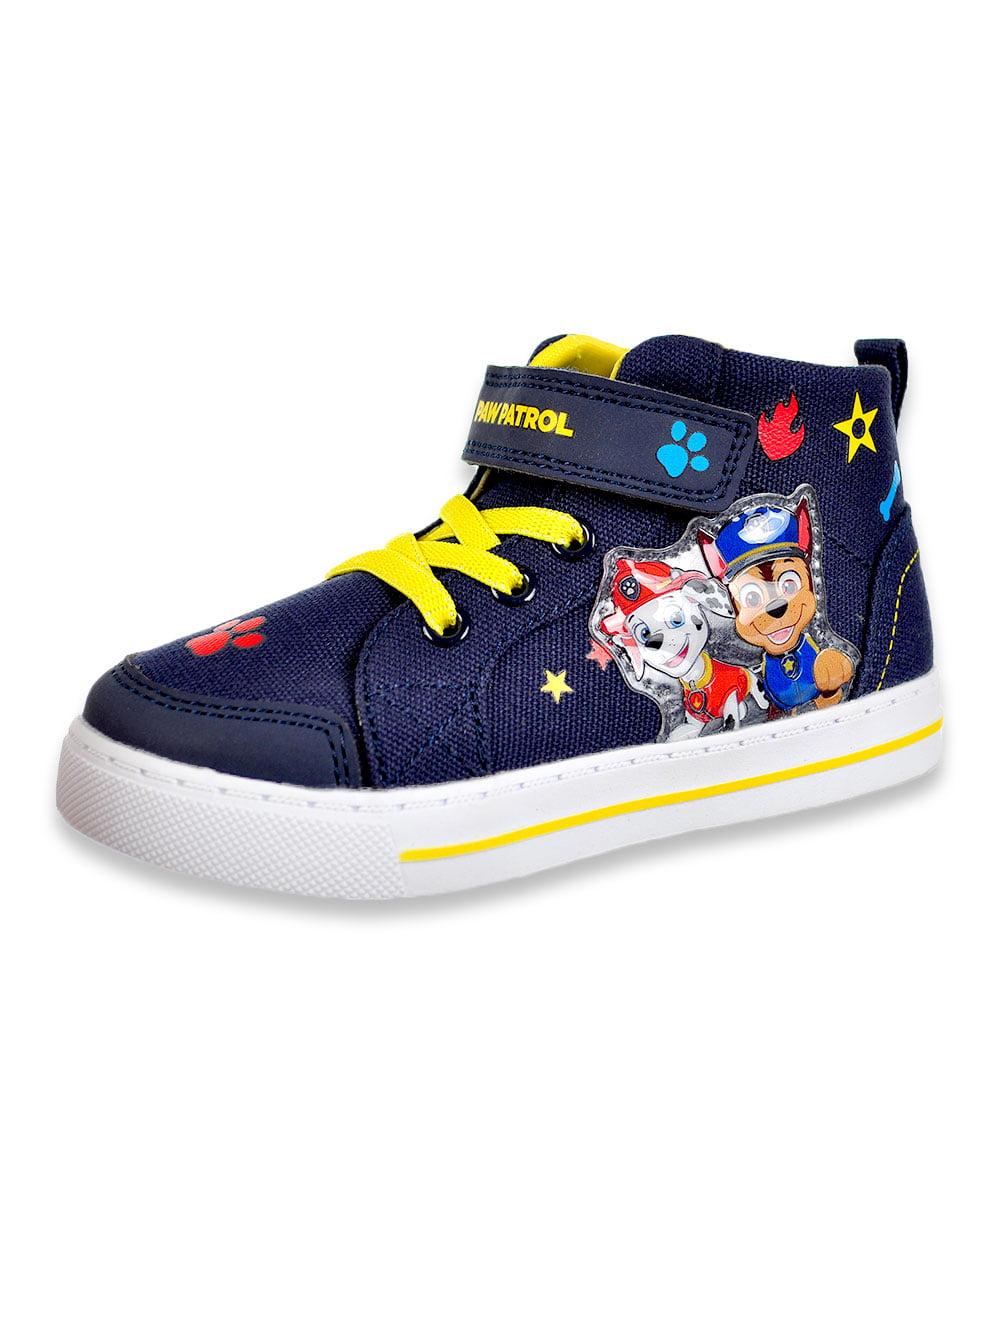 Paw Patrol Character High Top Sneaker